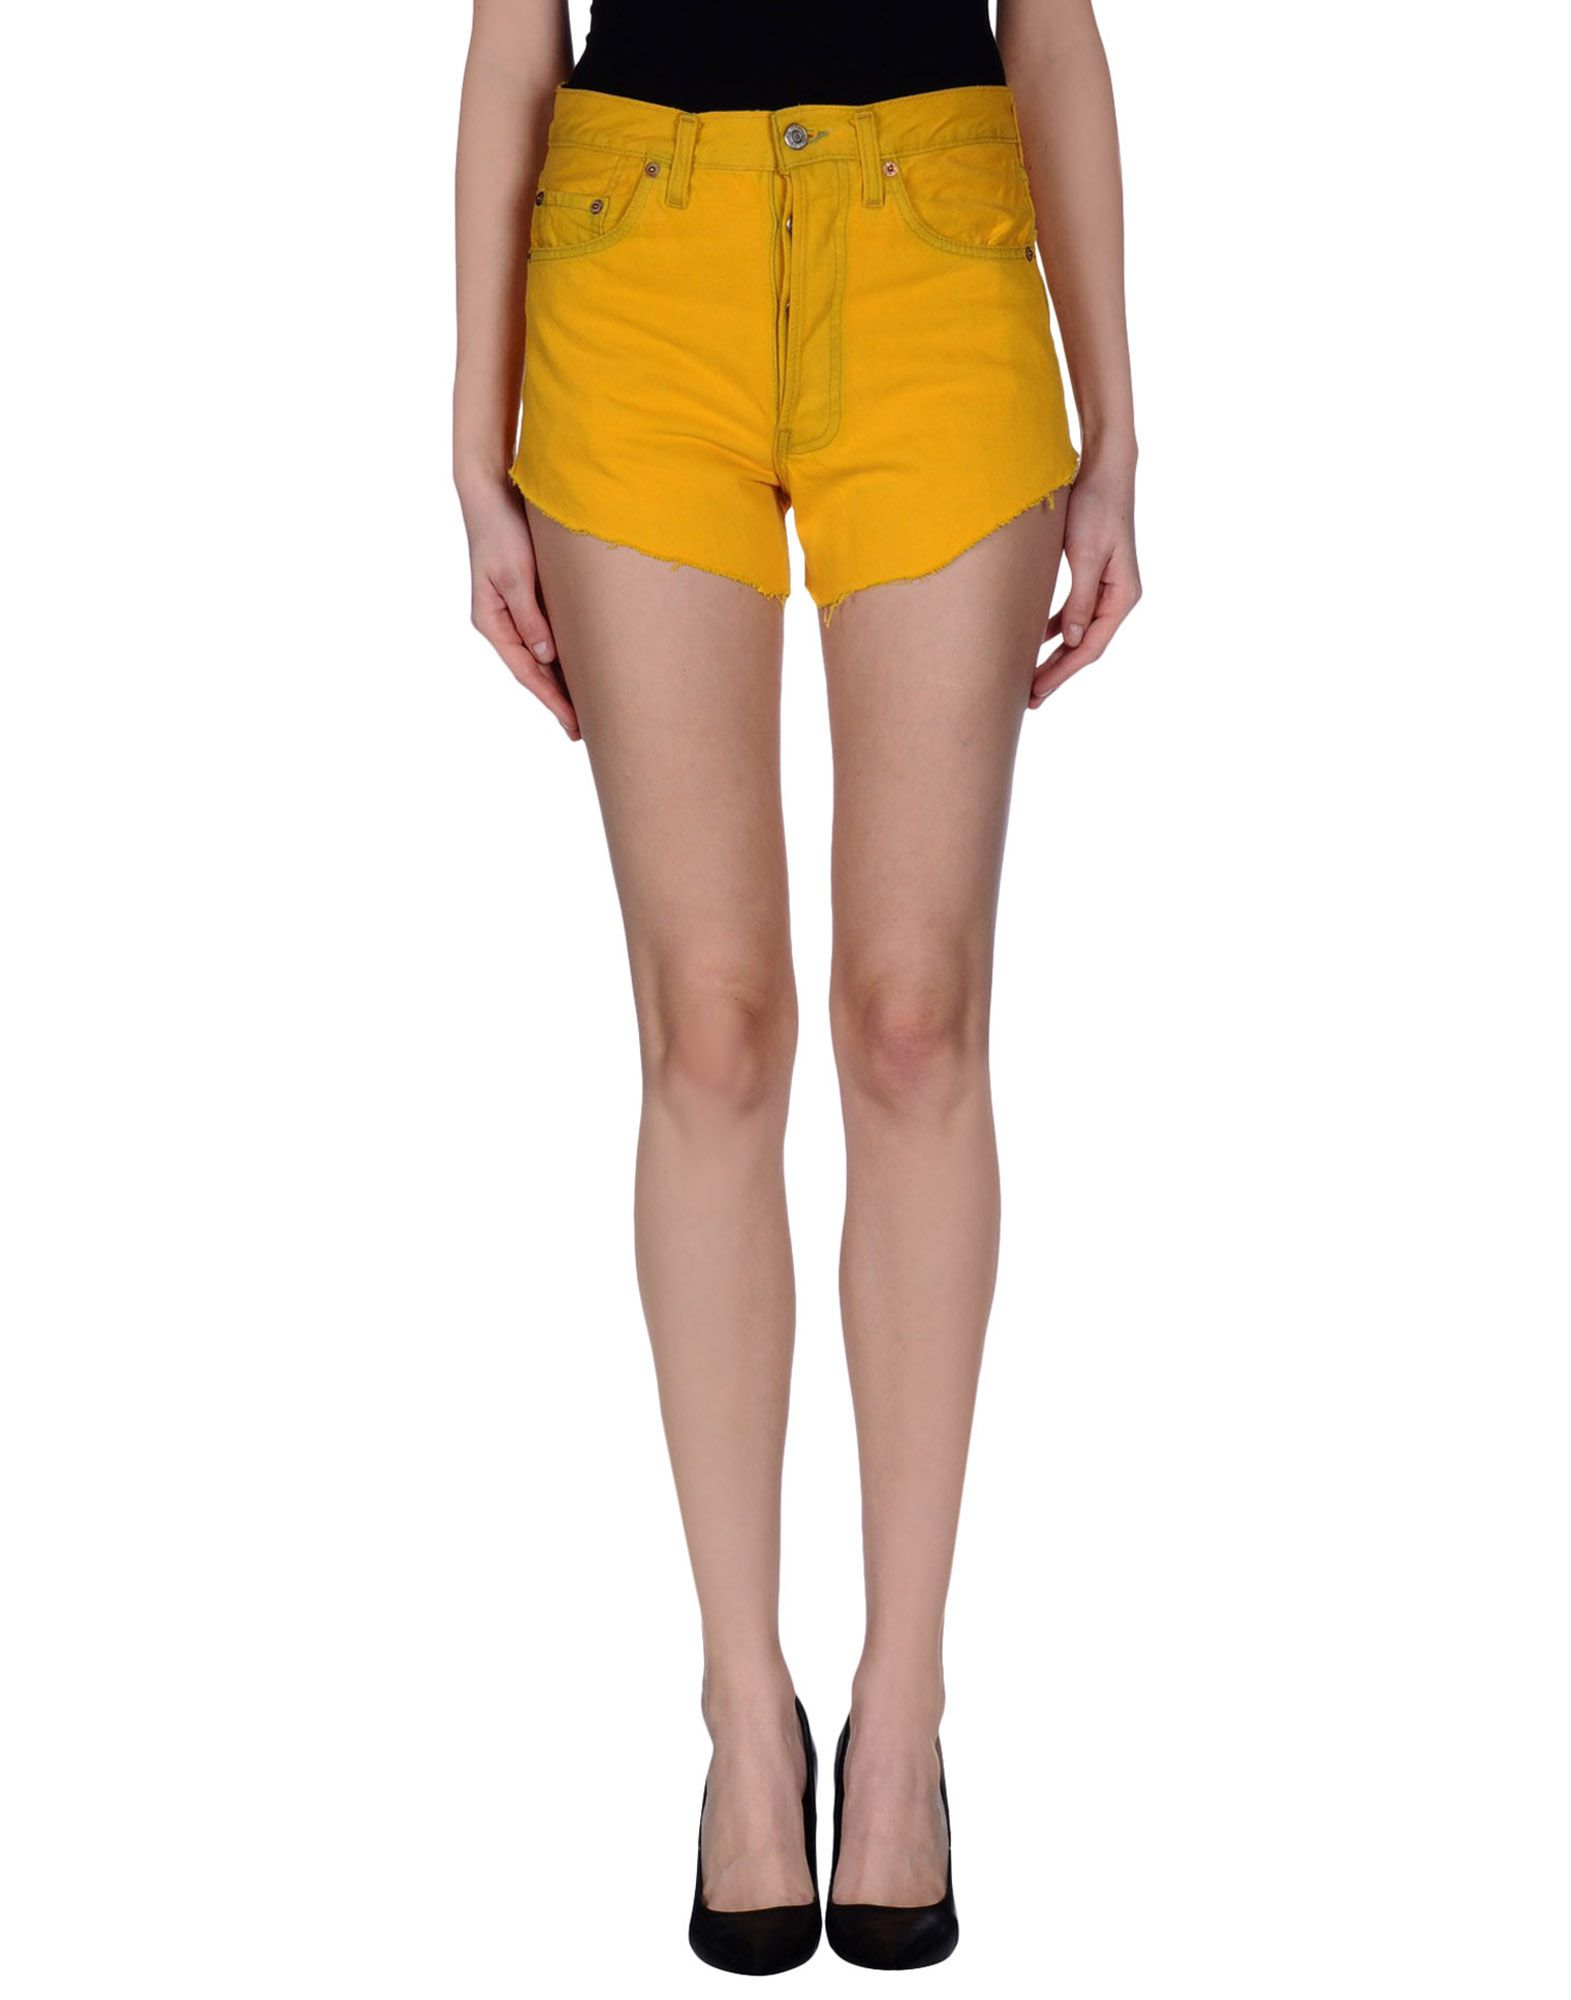 Levi's Red Tab Denim Shorts   Women Levi's Red Tab Denim Shorts   42412157VO